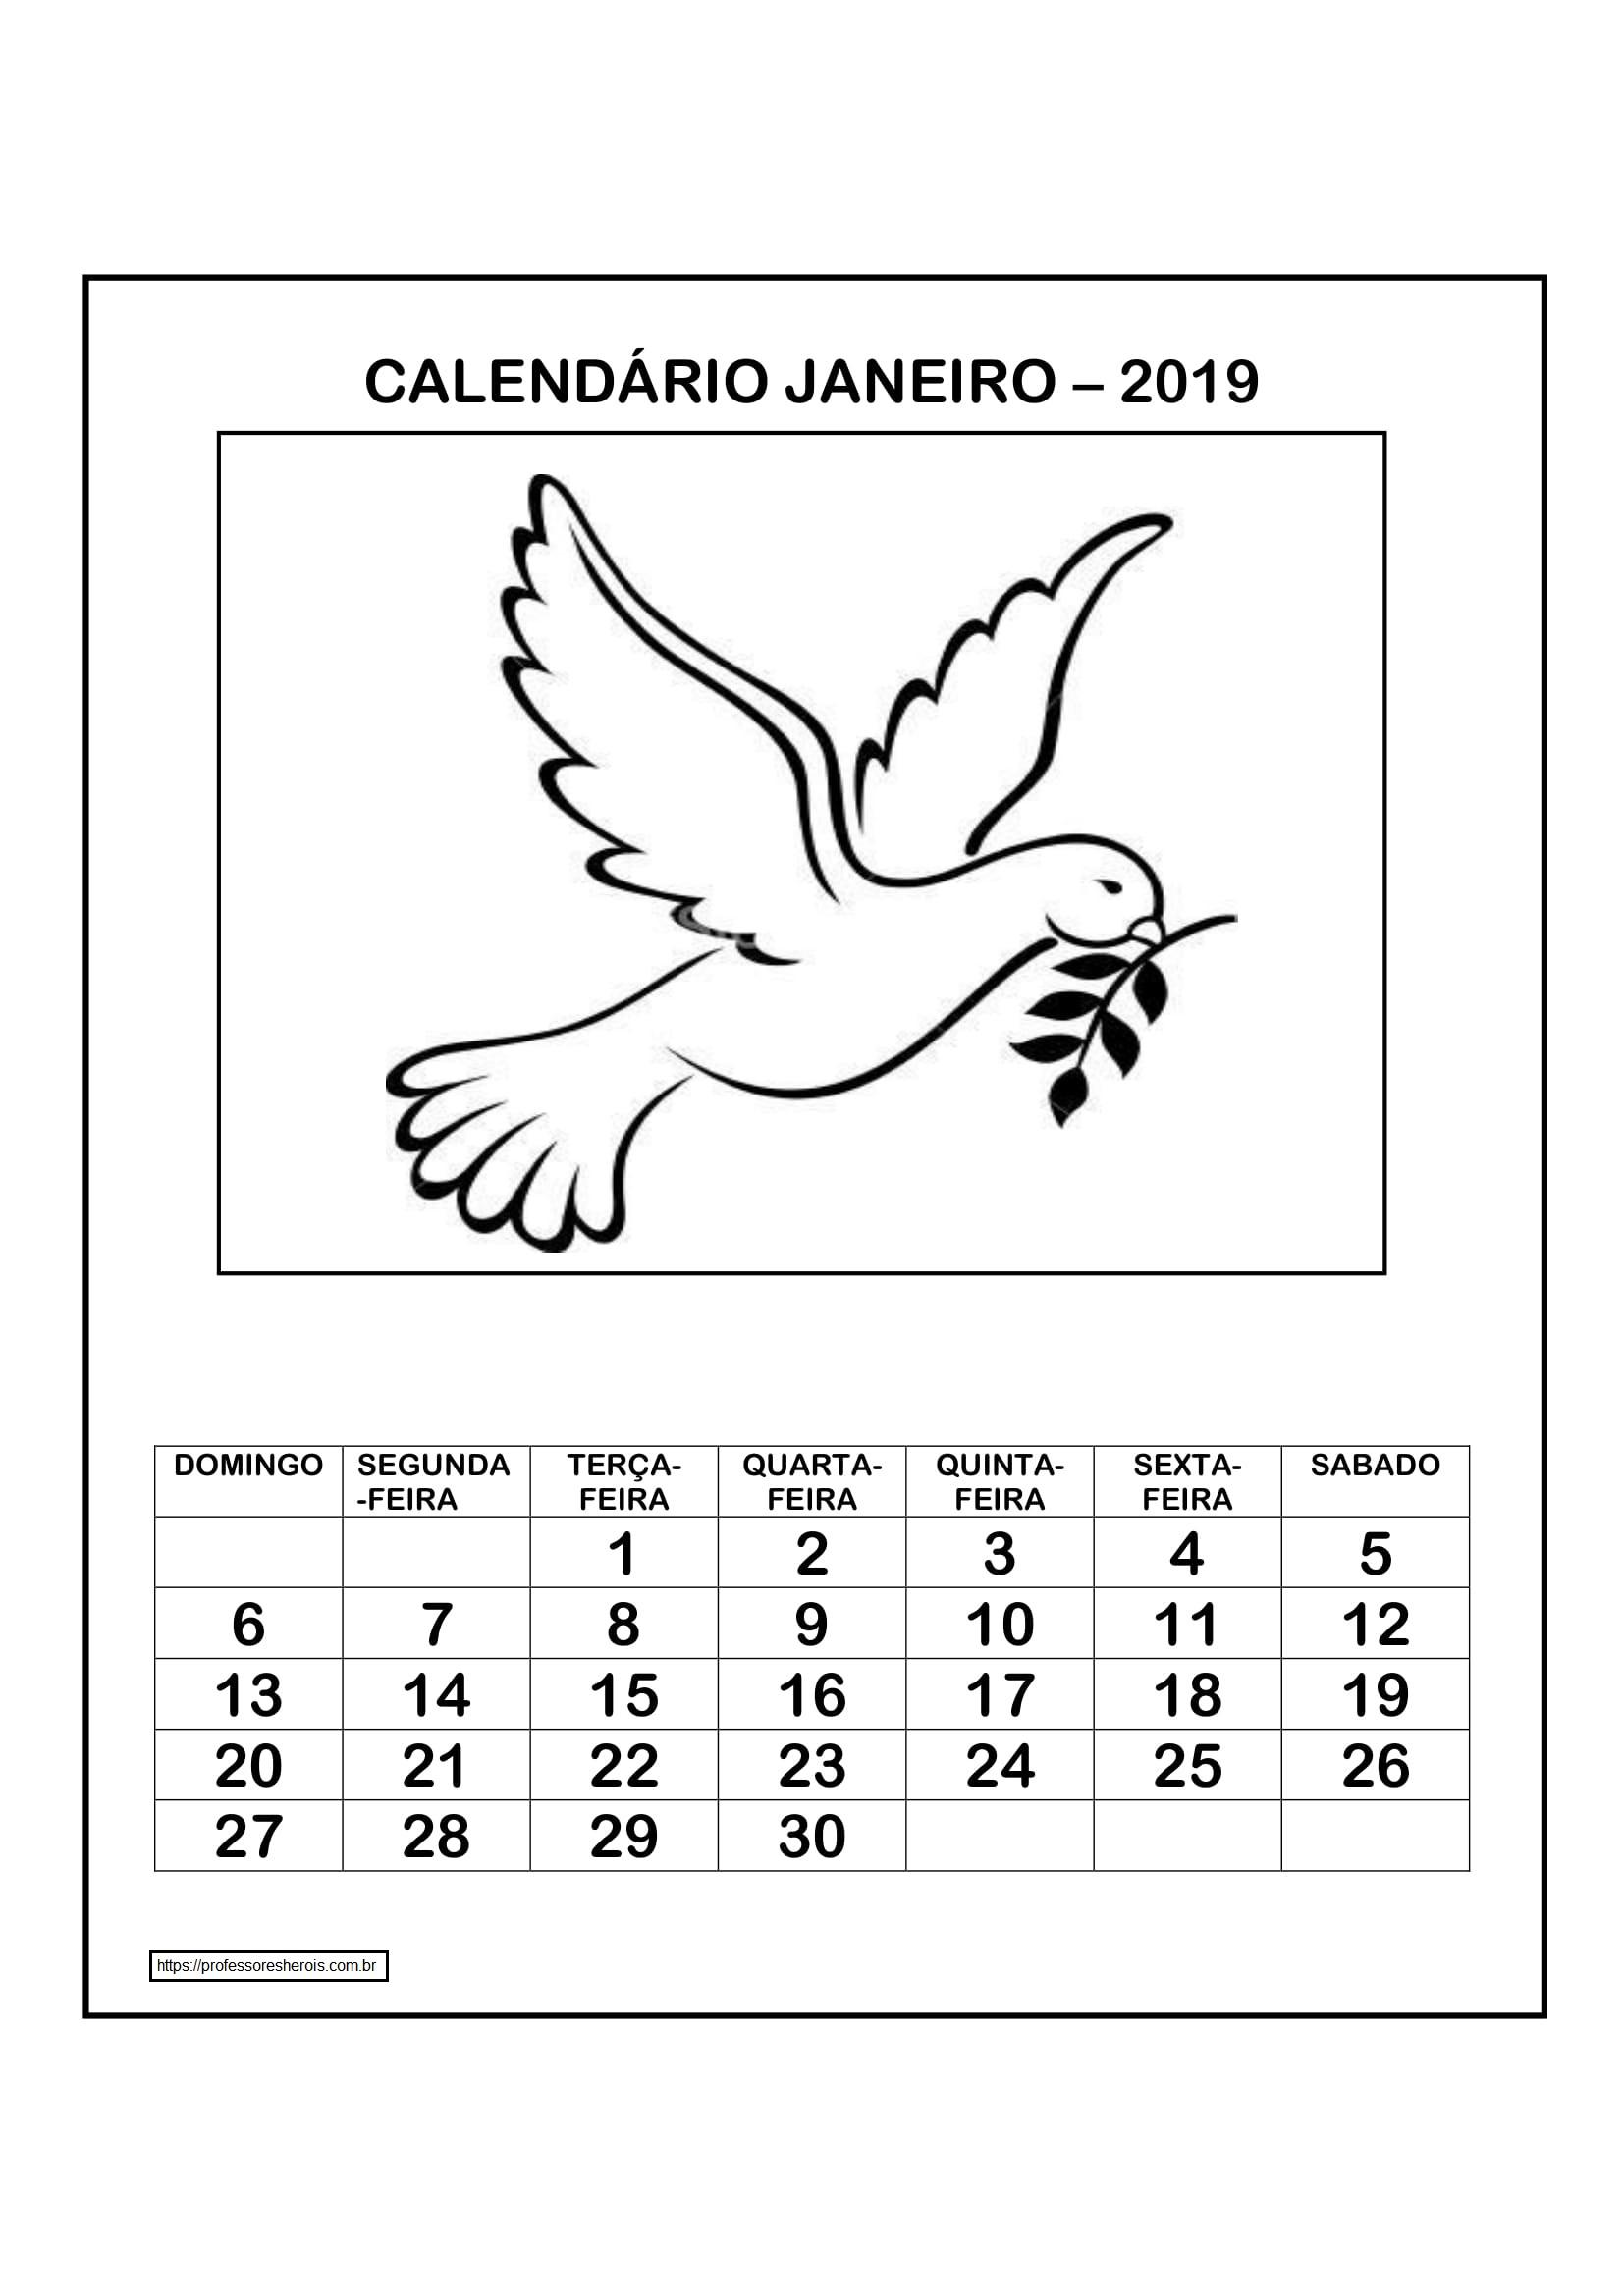 cadendario-para-completar-e-colorir-2019-janeiro-D-1